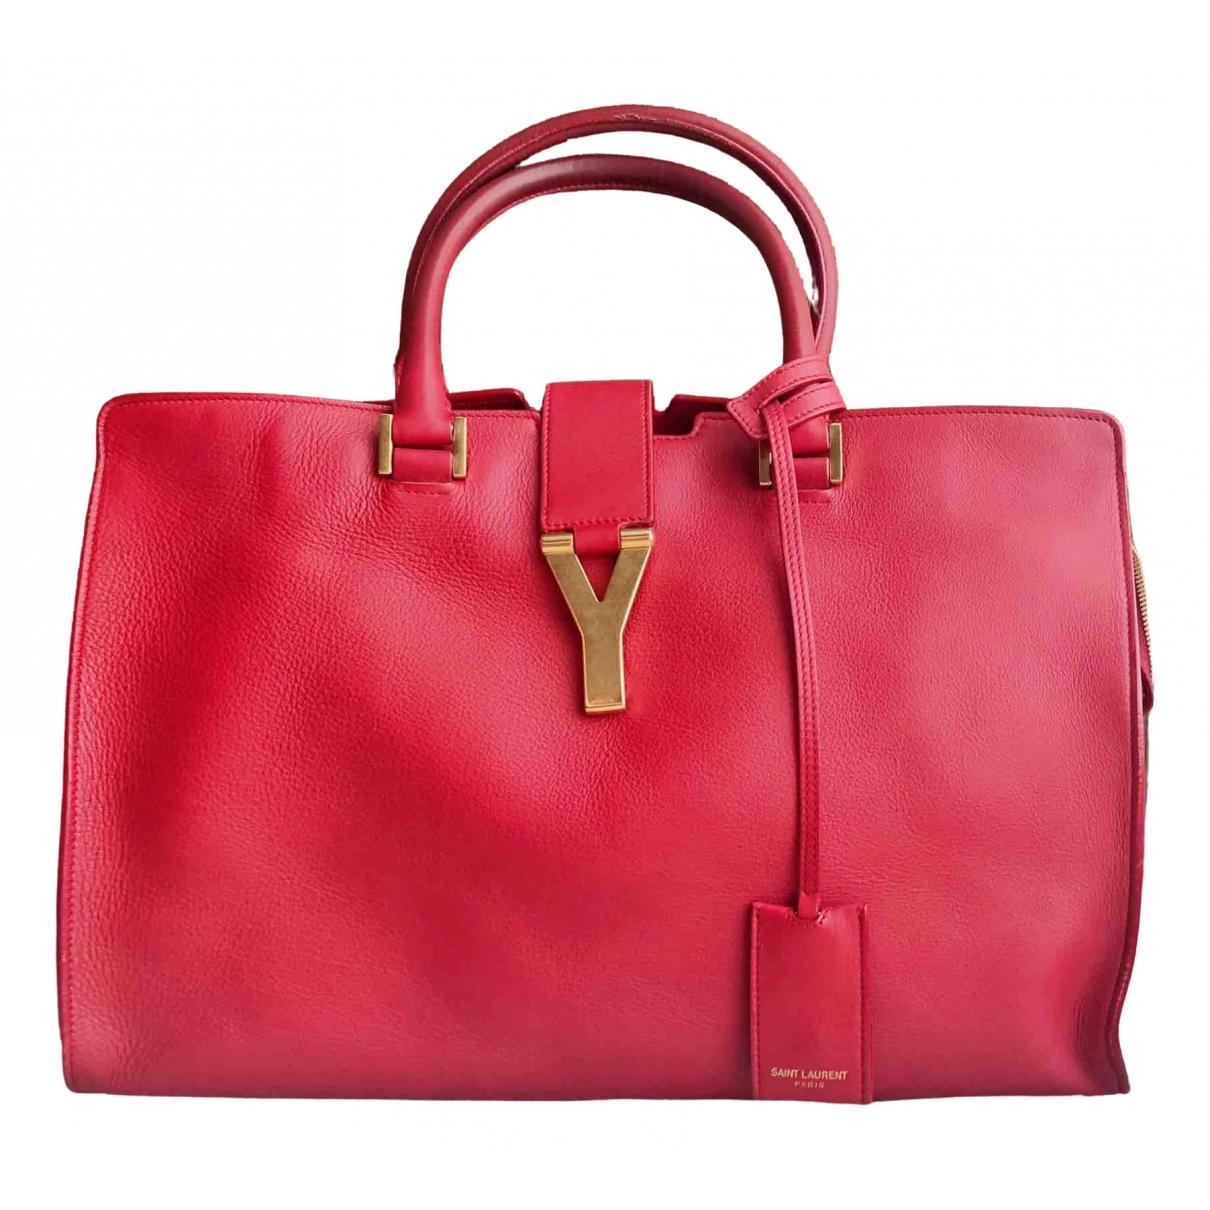 Saint Laurent Chyc Red Leather handbag for Women \N